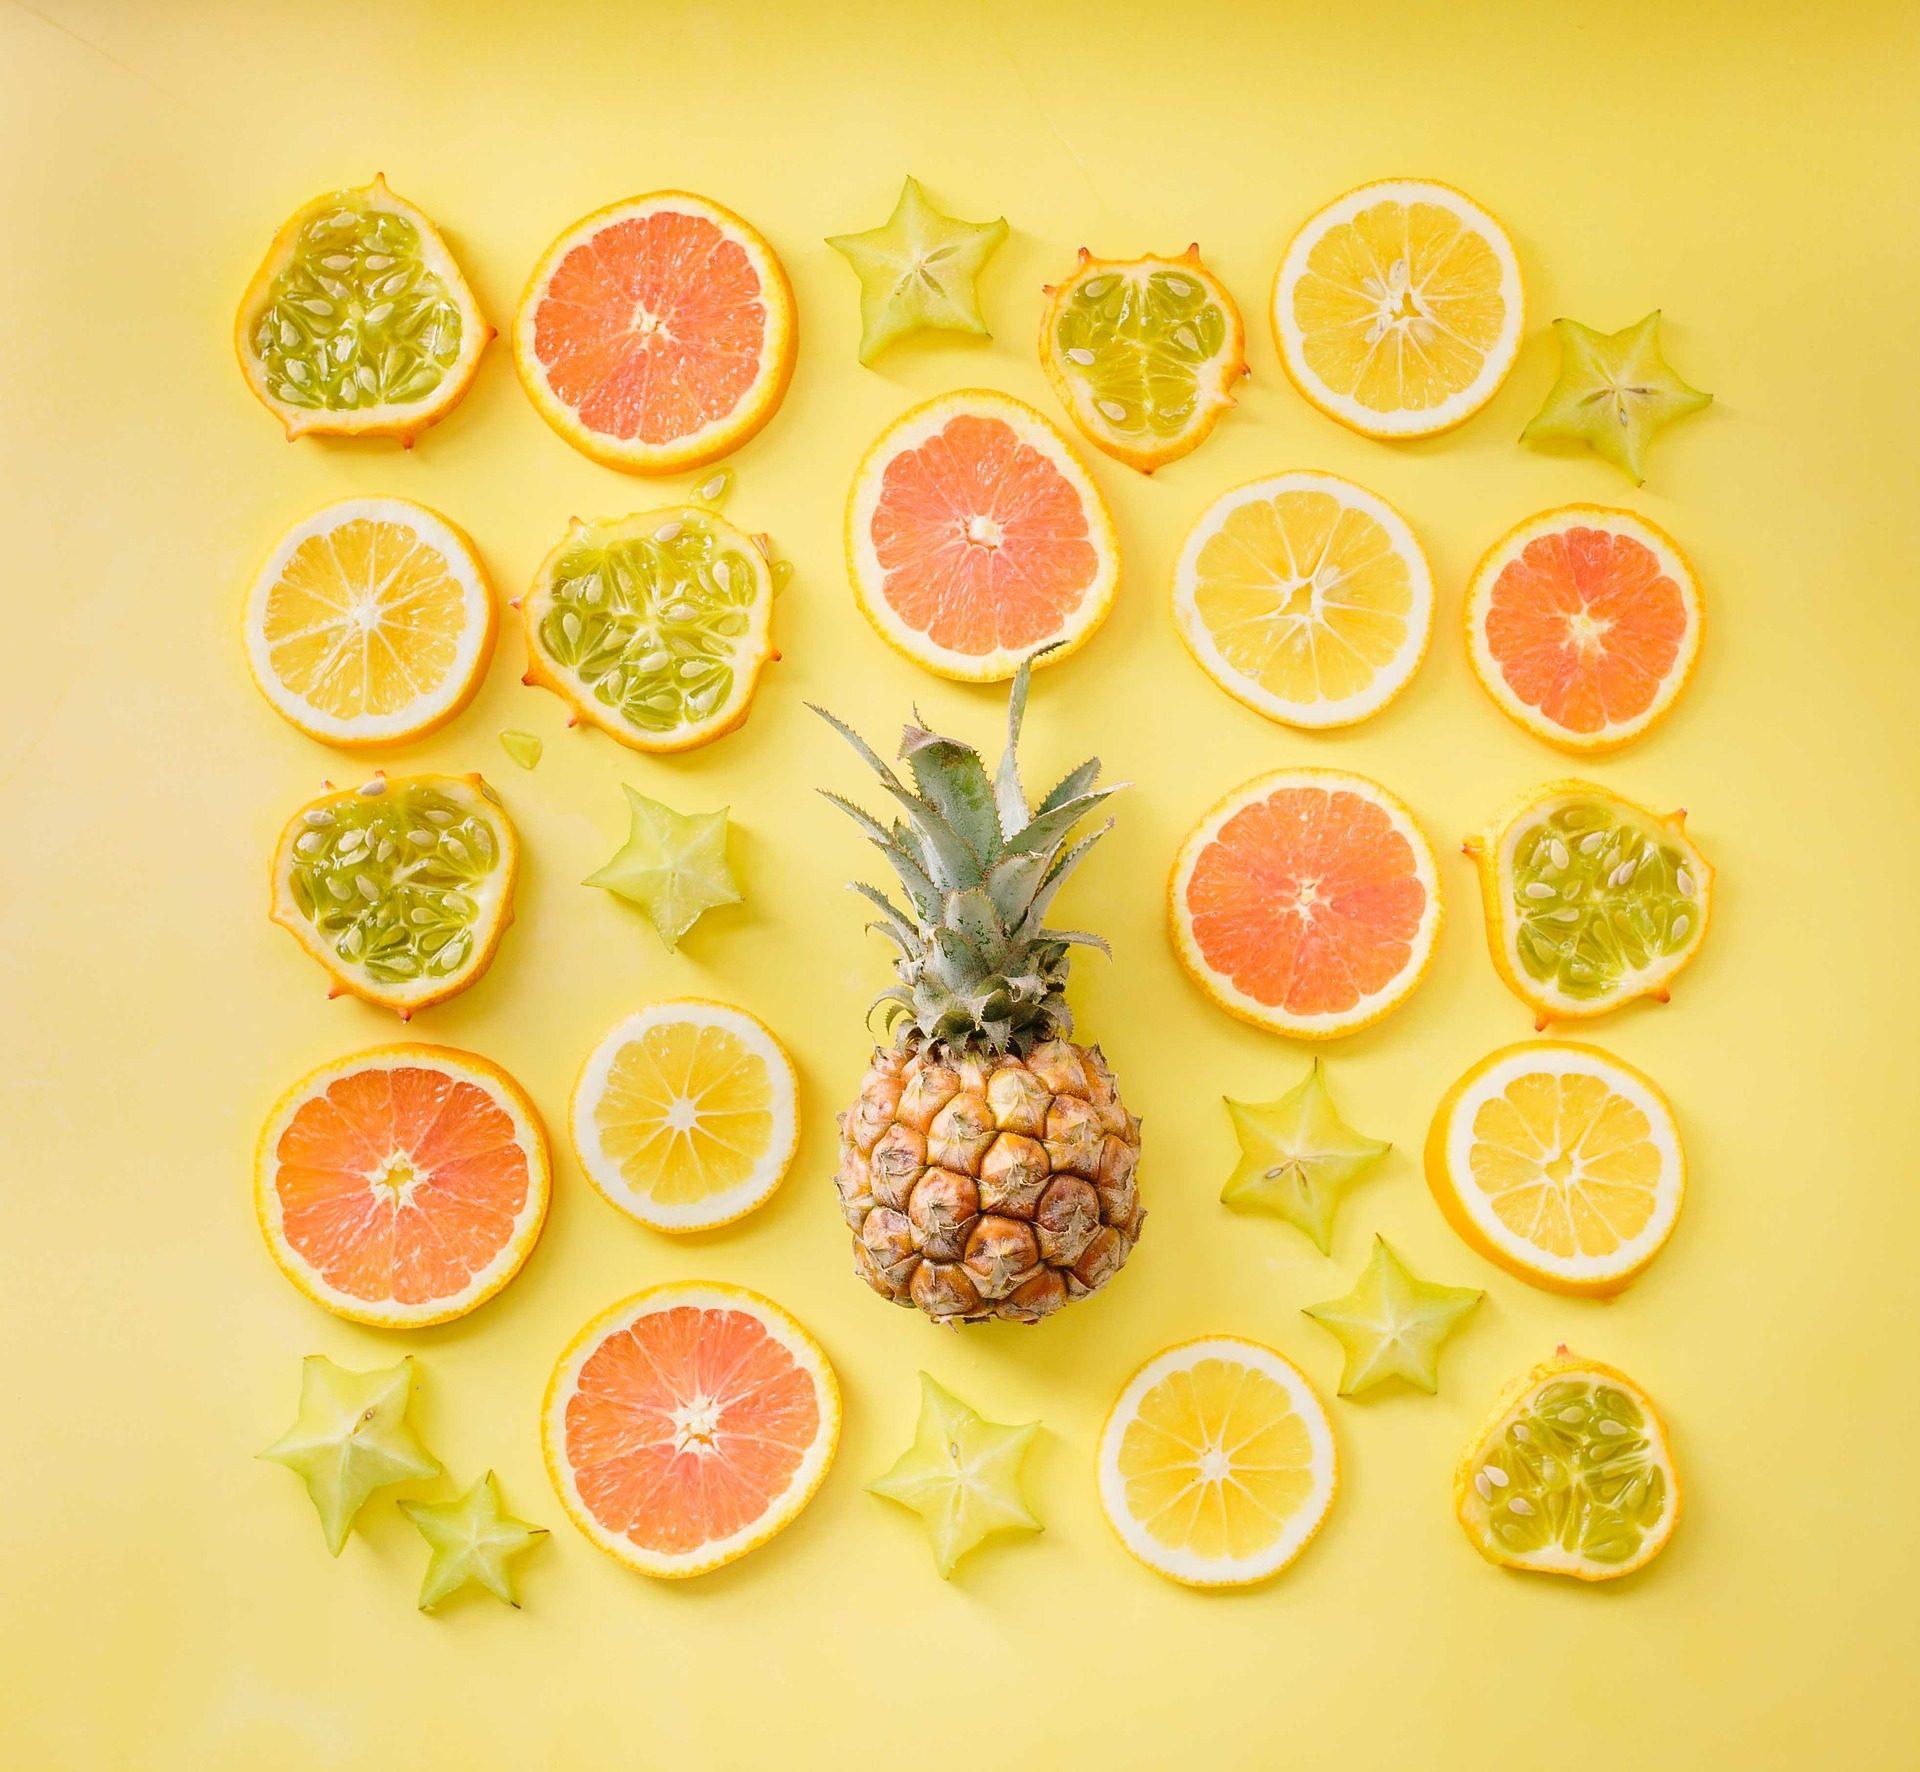 Obst, Mosaik, Ananas, Grapefruit, Zitronen - Wallpaper HD - Prof.-falken.com